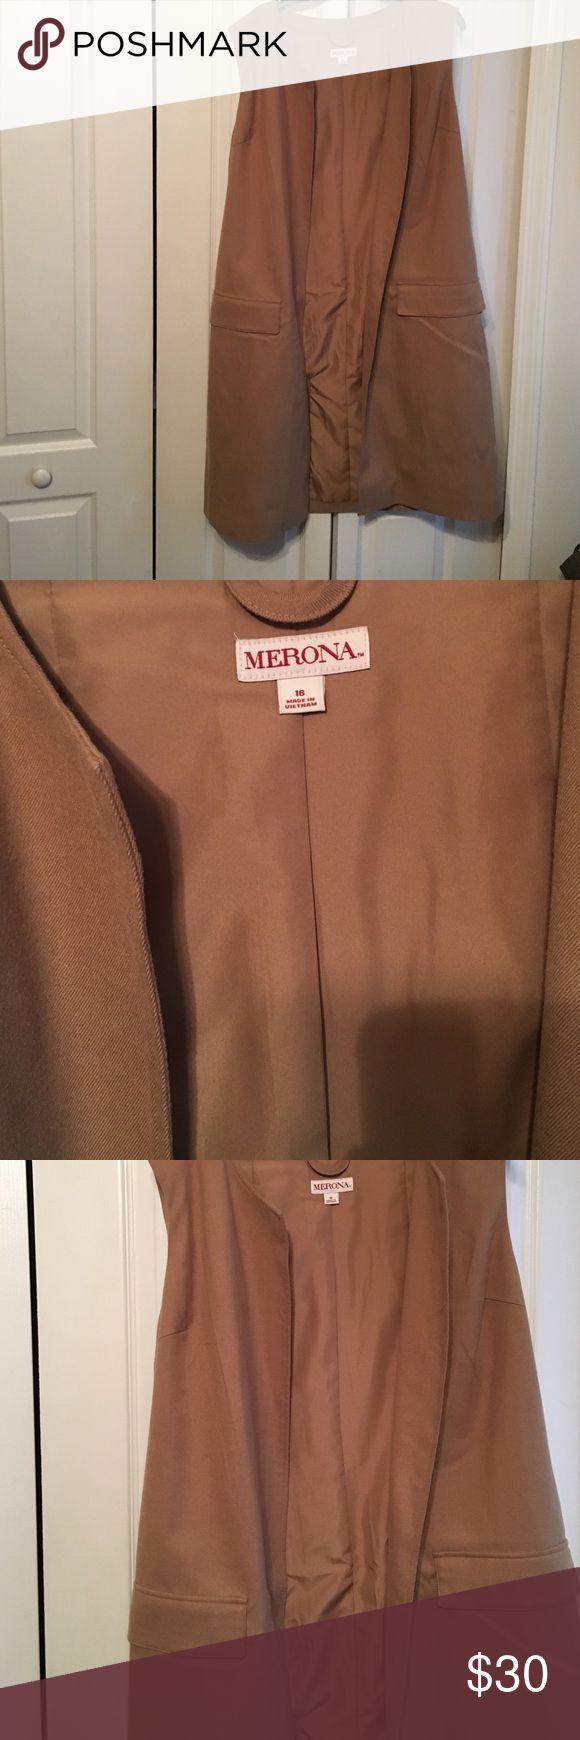 Ladies Long Camel Vest Size 16 NWT Merona Vest Merona Jackets & Coats Vests